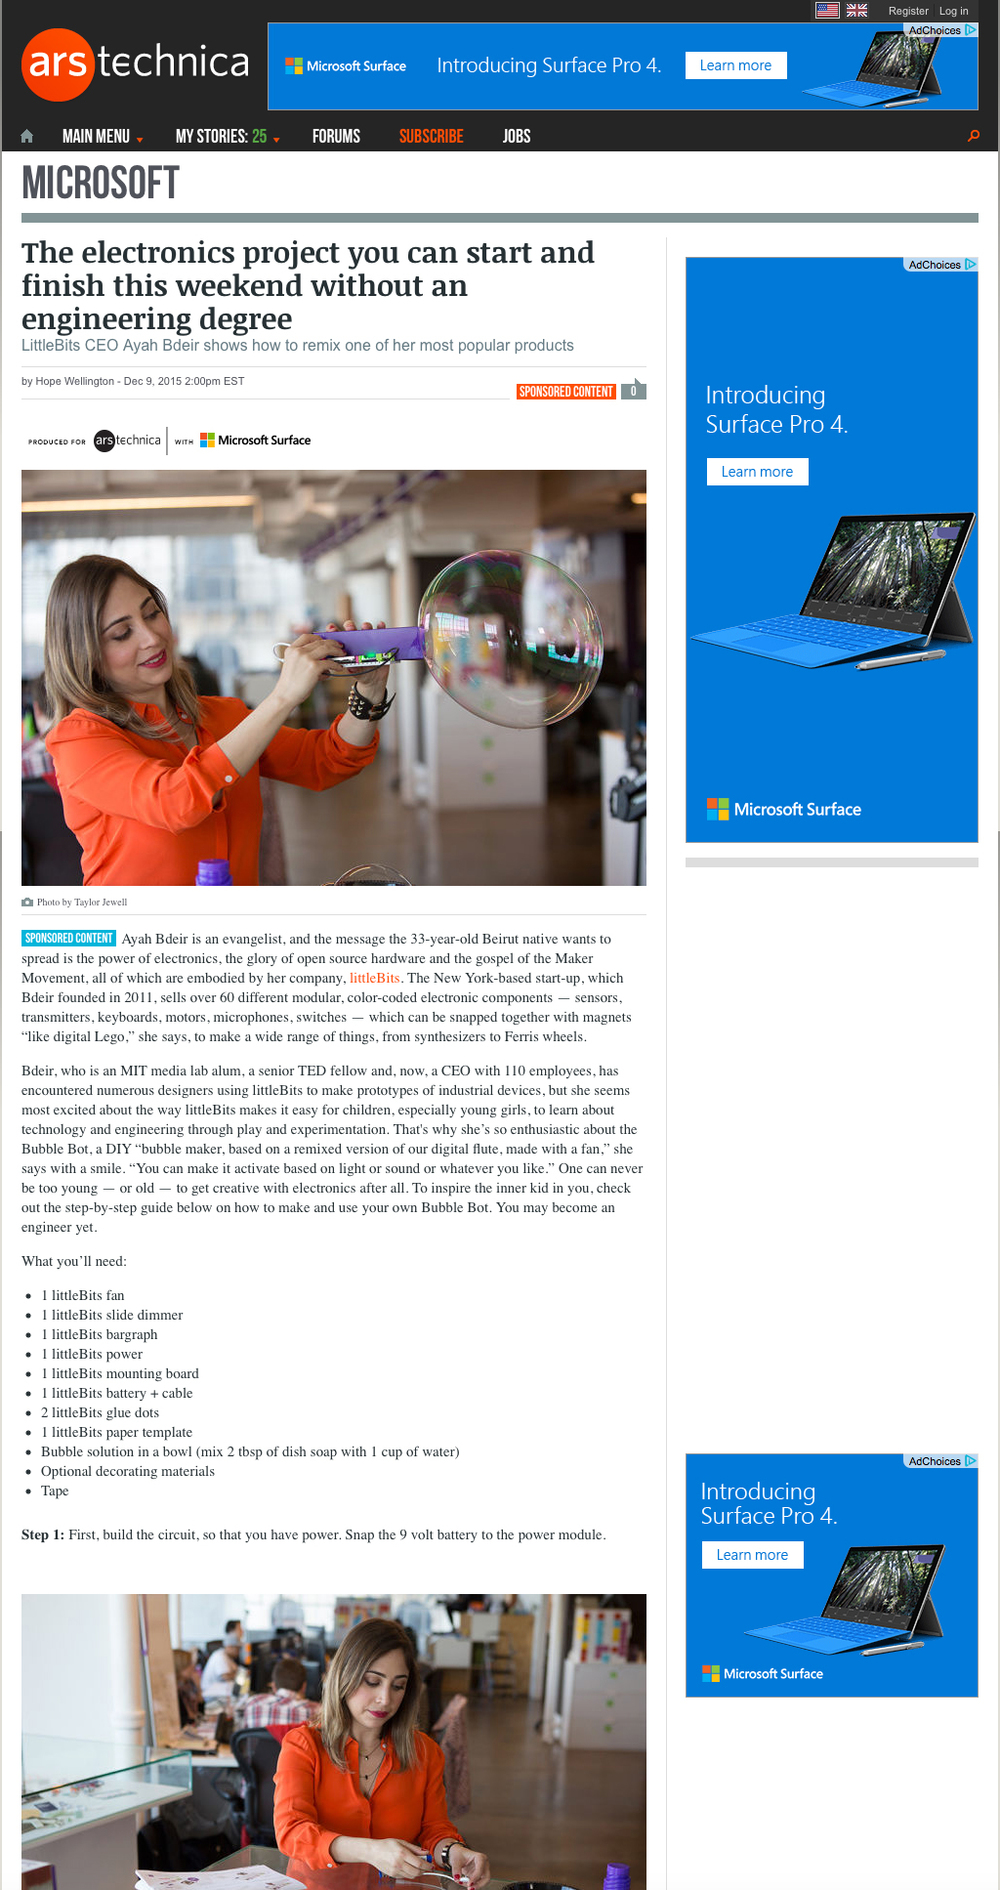 Microsoft_Article03_AyahBdeir_ARS.jpg